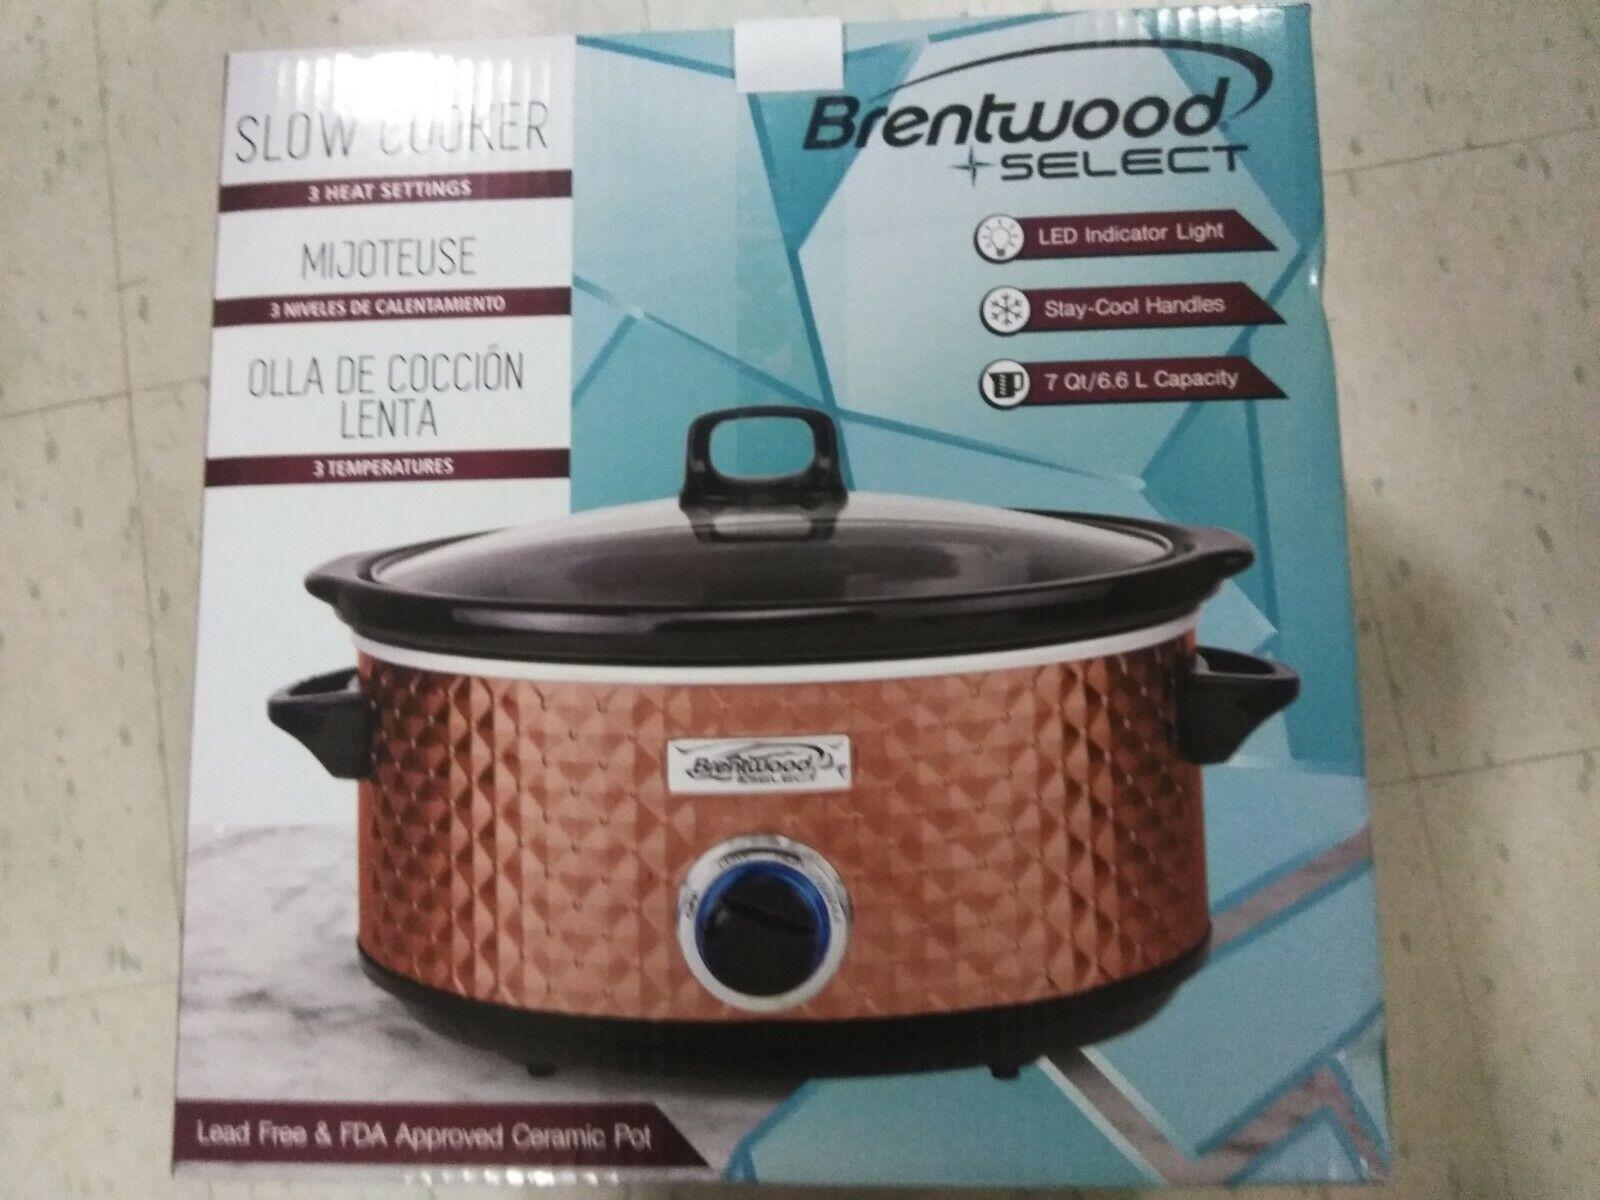 Slow Cooker 7-Quart Capacity Copper Color Brentwood Applianc